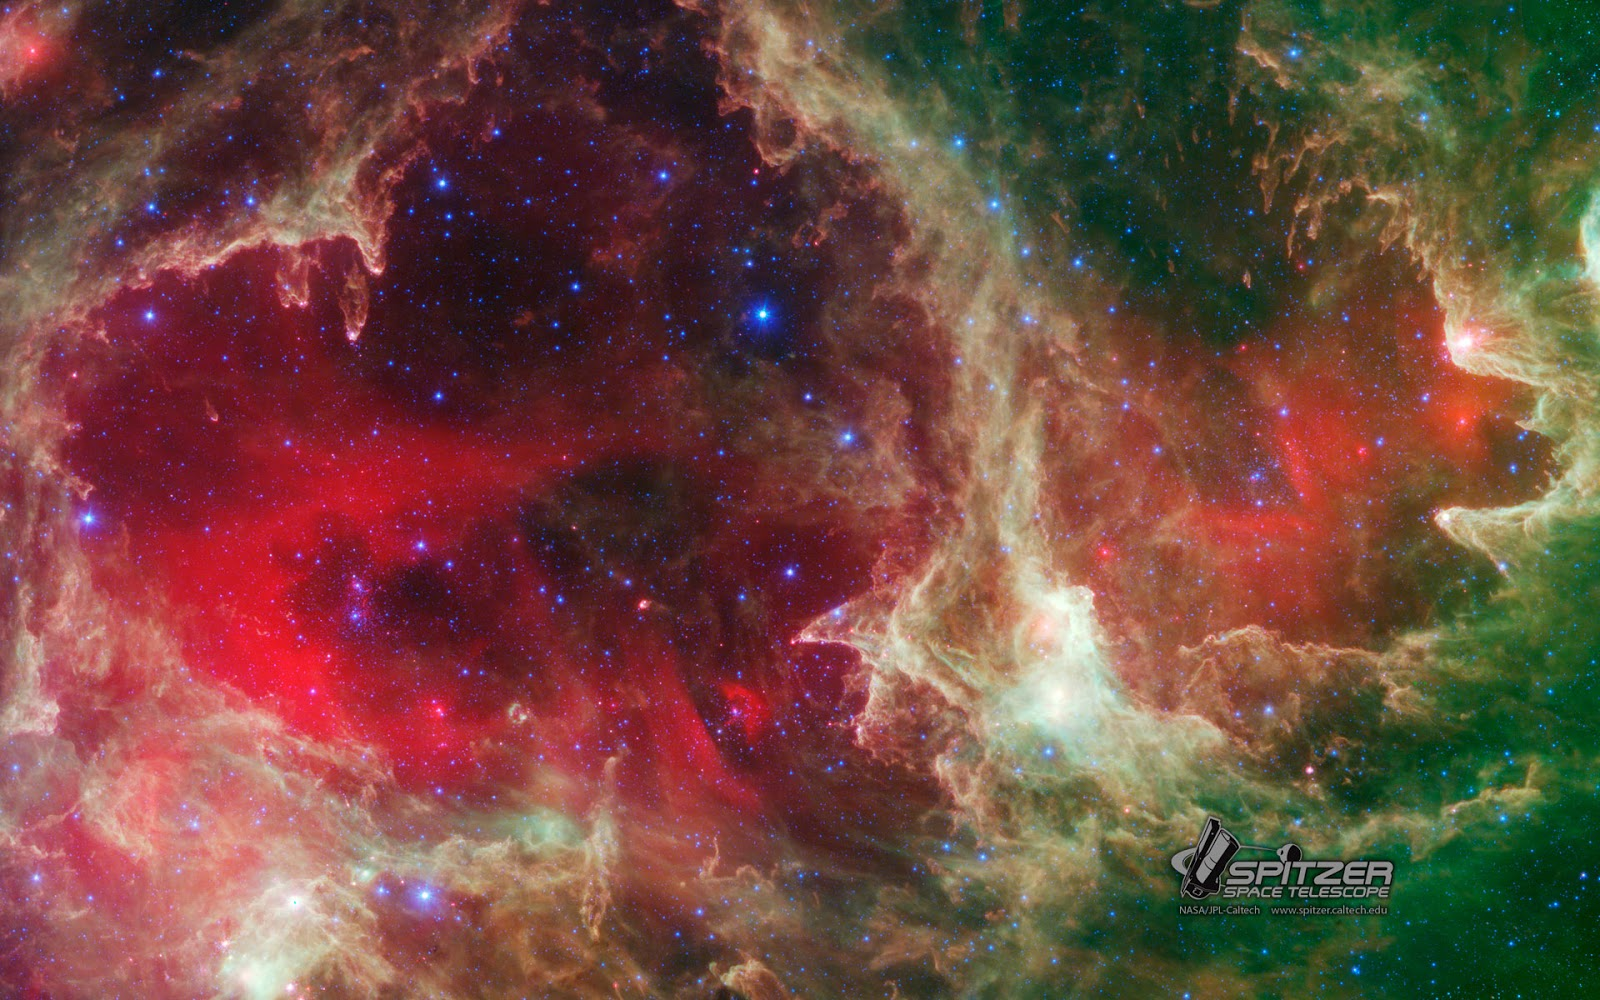 Free wallpapaers nasa spacescap - Spitzer space telescope wallpaper ...